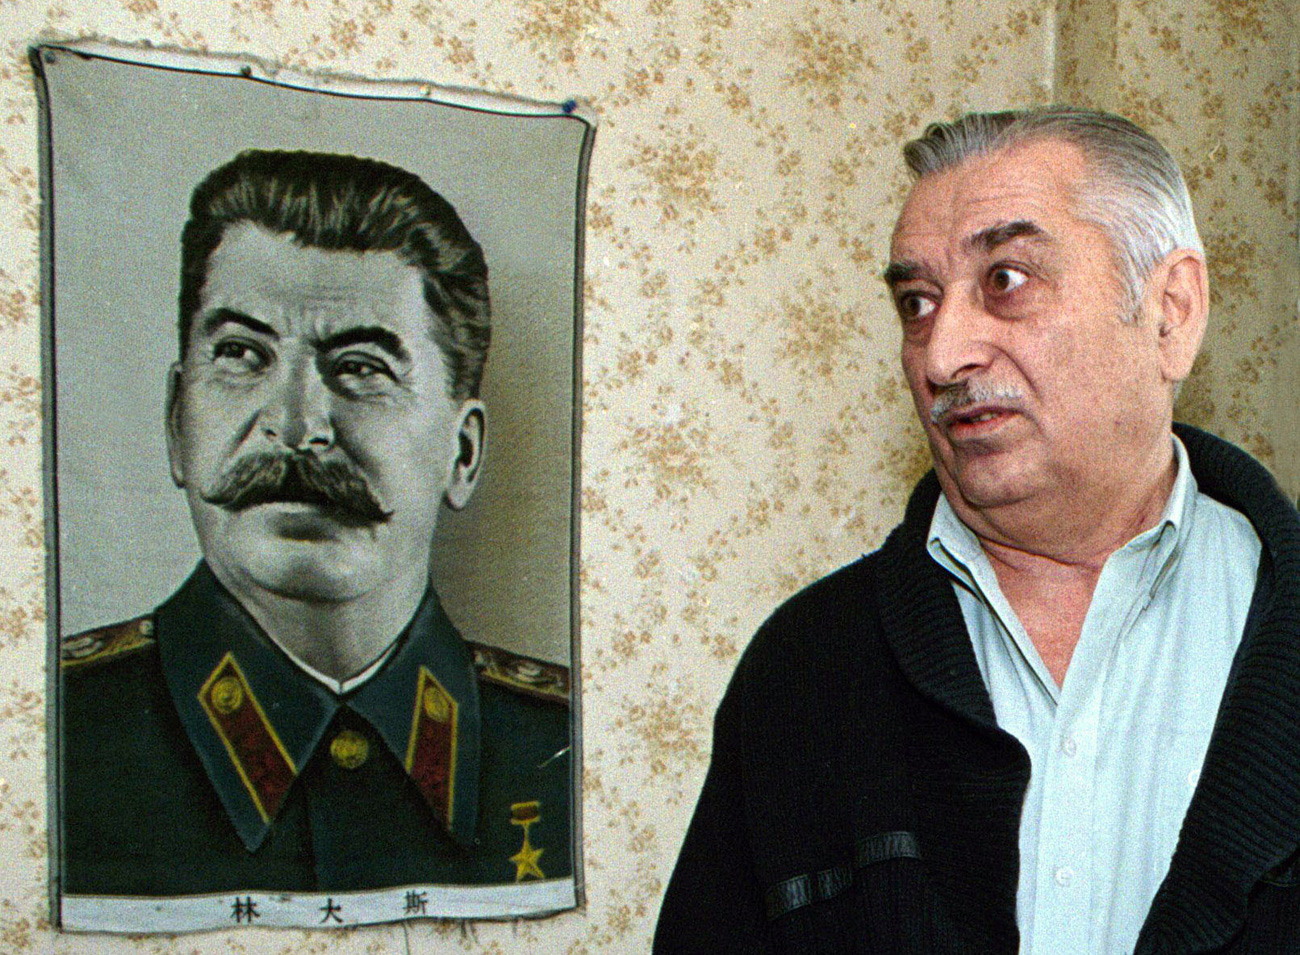 Yevgeny Dzhugashvili, cucu diktator Soviet Joseph Stalin.